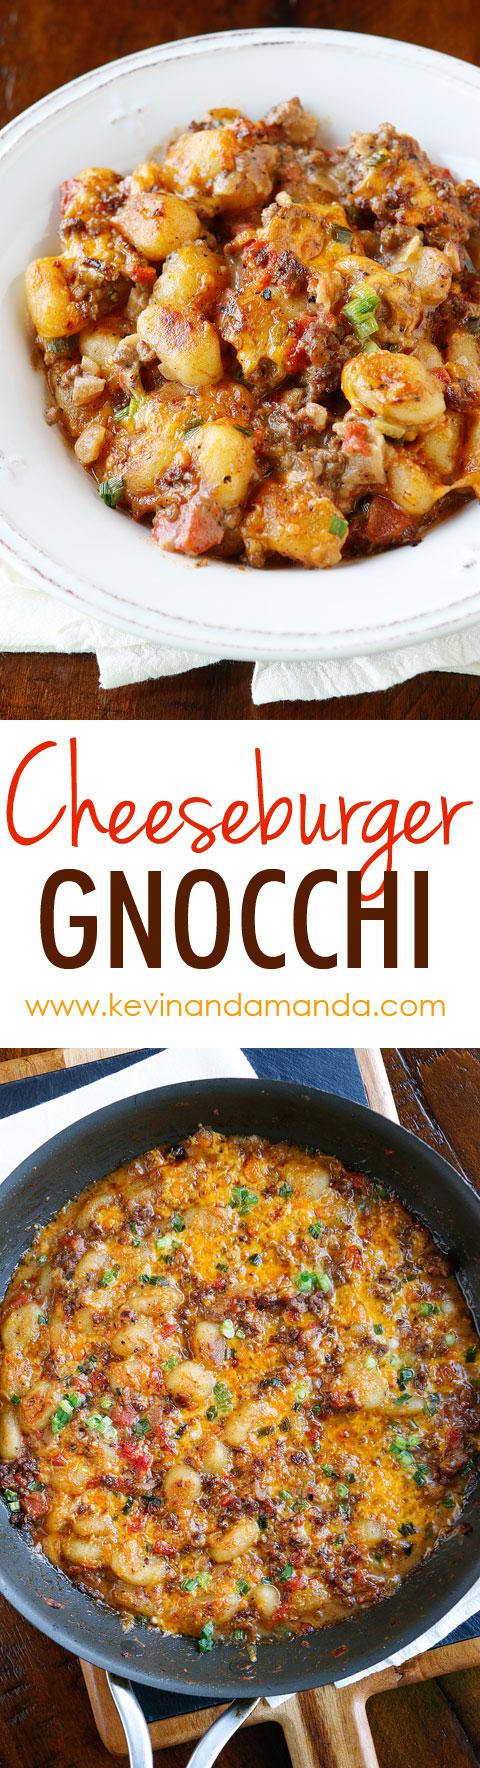 Cheeseburger Gnocchi recipe